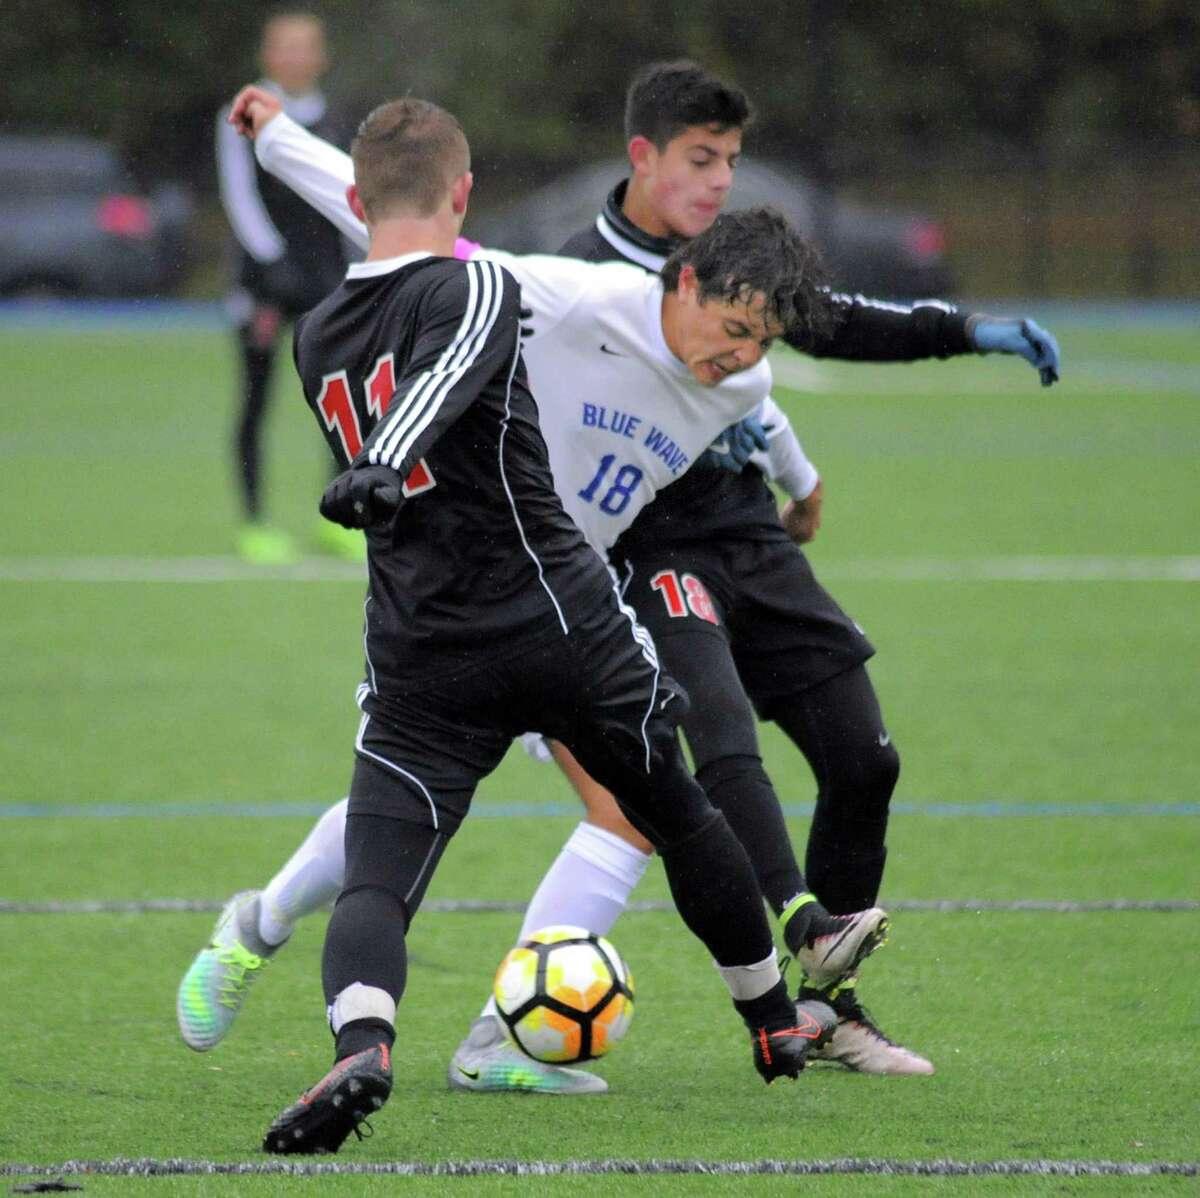 Darien Pablo Martinez splits Fairfield Warde defenders David Harvey and Lucas Montero in a FCIAC Boys Soccer Quarterfinal game in Darien, Conn. on Thursday, Oct. 27, 2016.